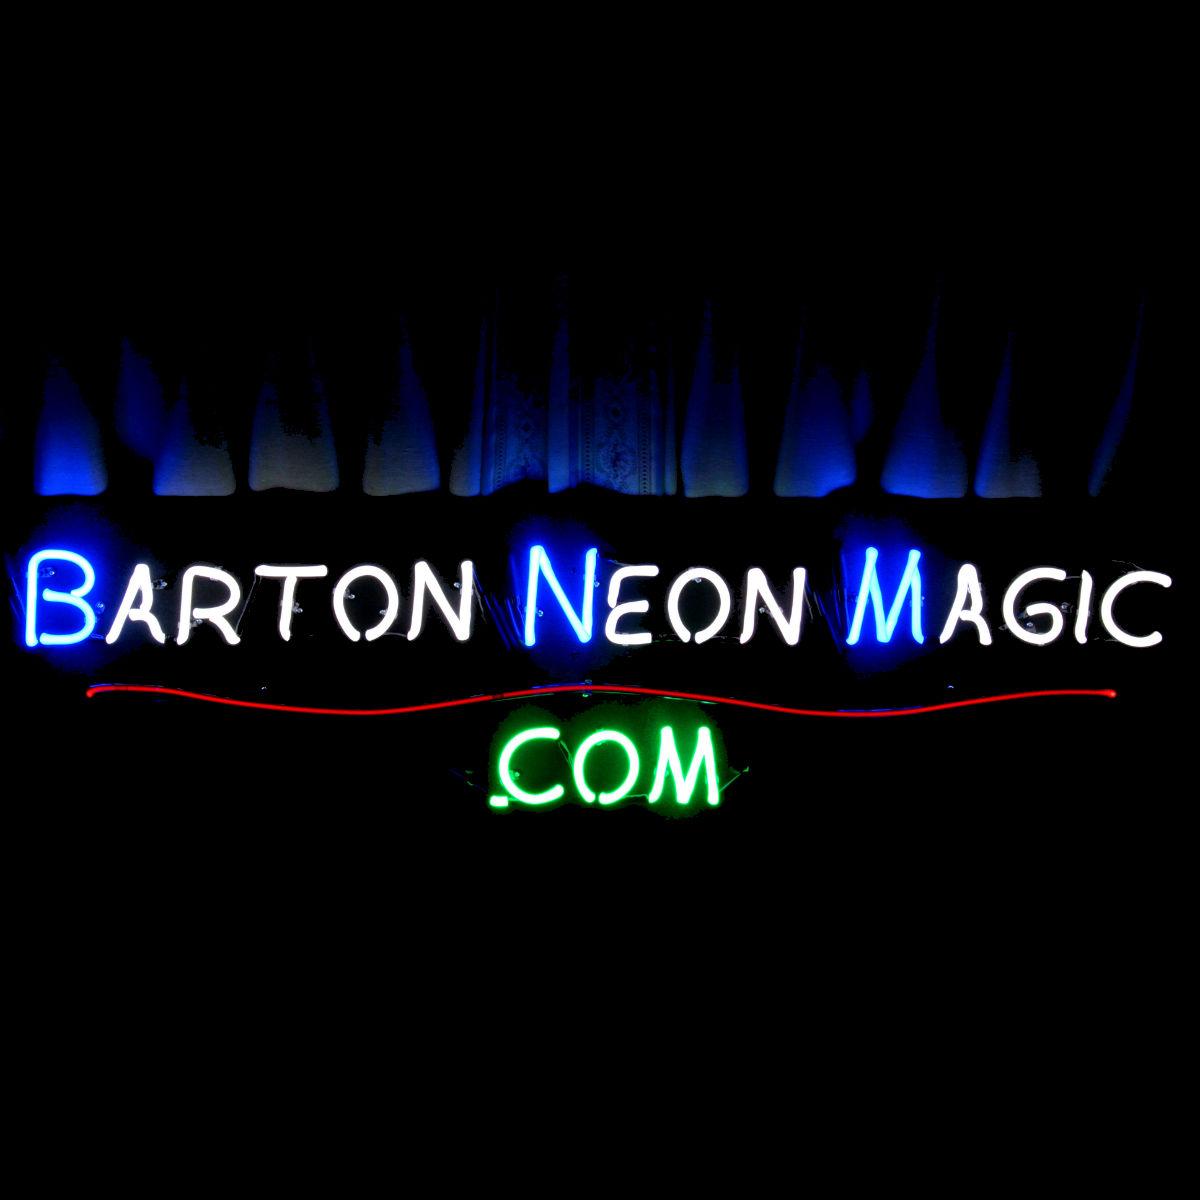 BartonNeonMagic.com - THE FINEST in Designer Neon Lighting - by John Barton - Famous USA Neon Glass Artist